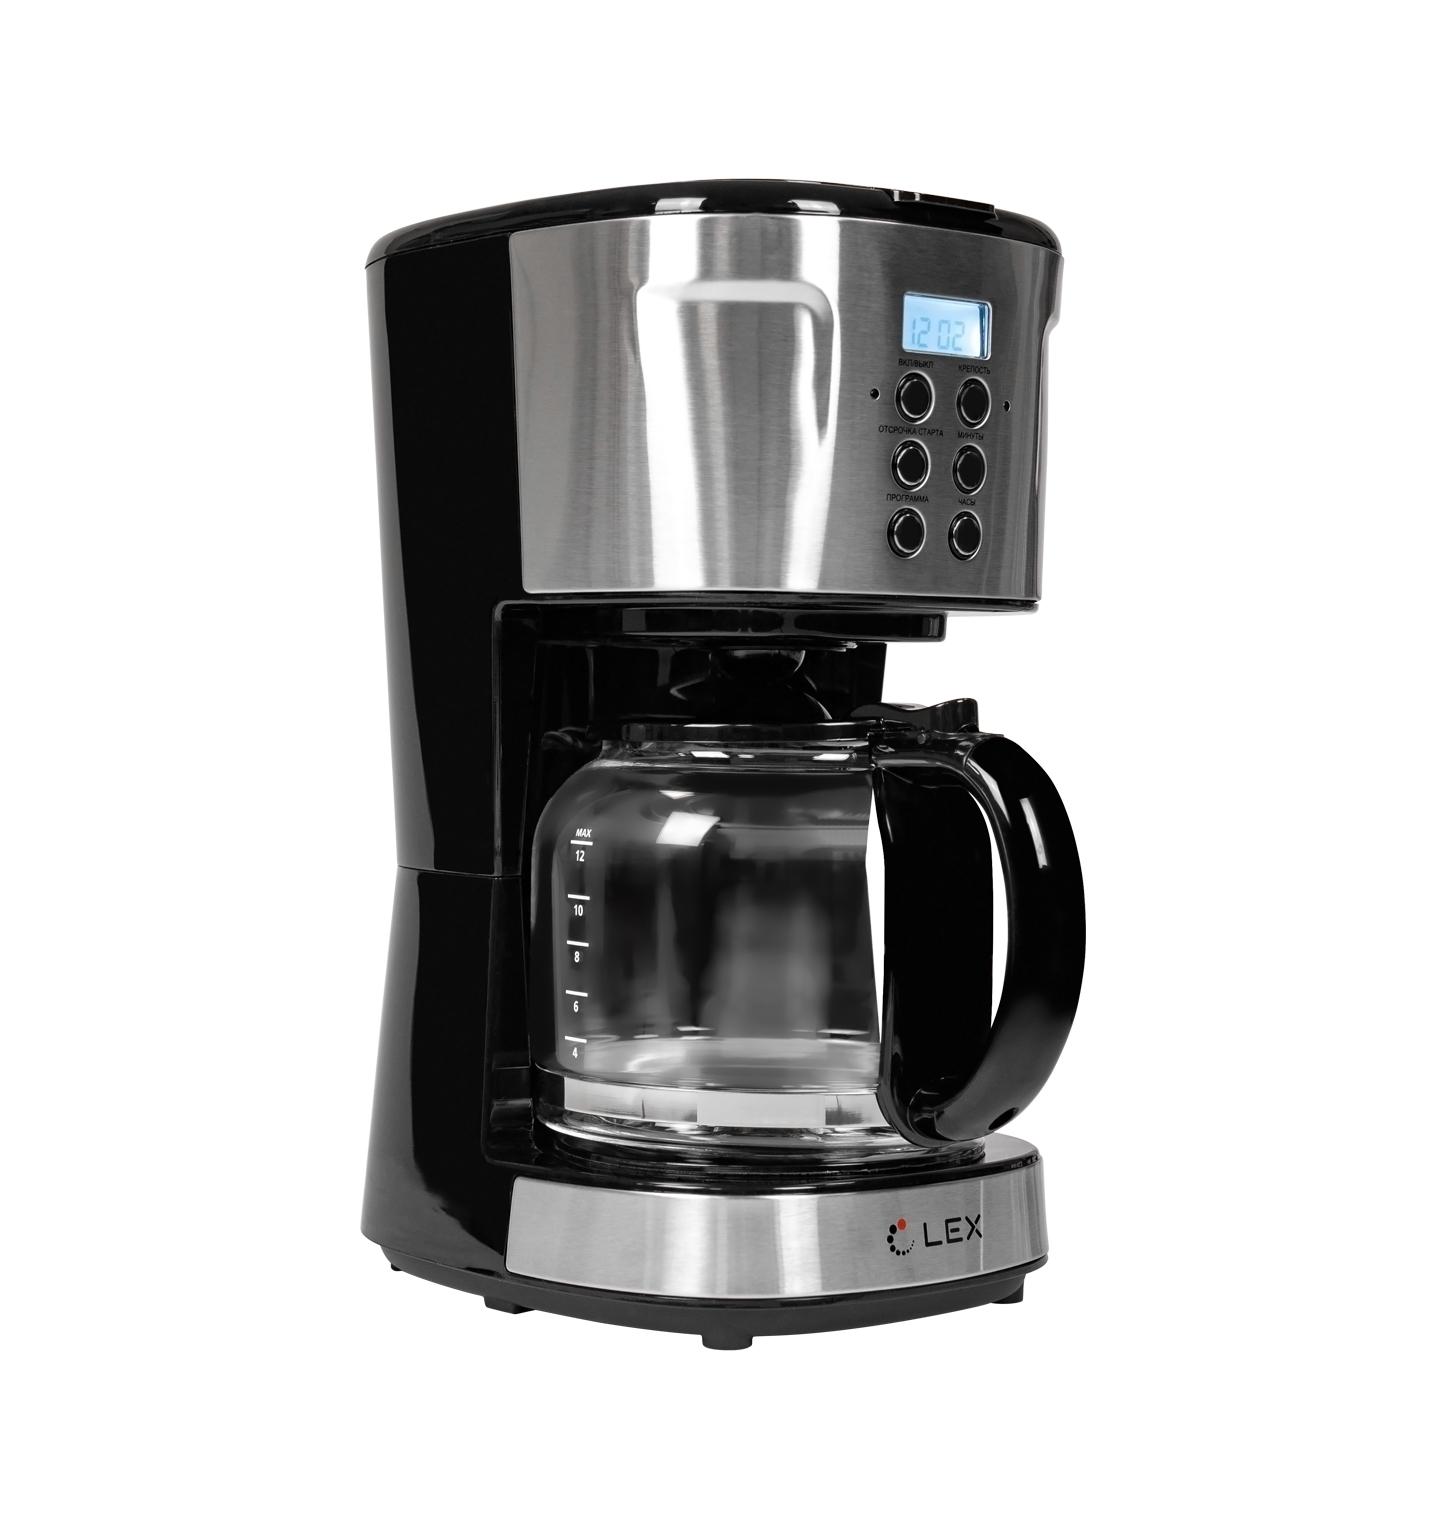 LEX LX-3501-1